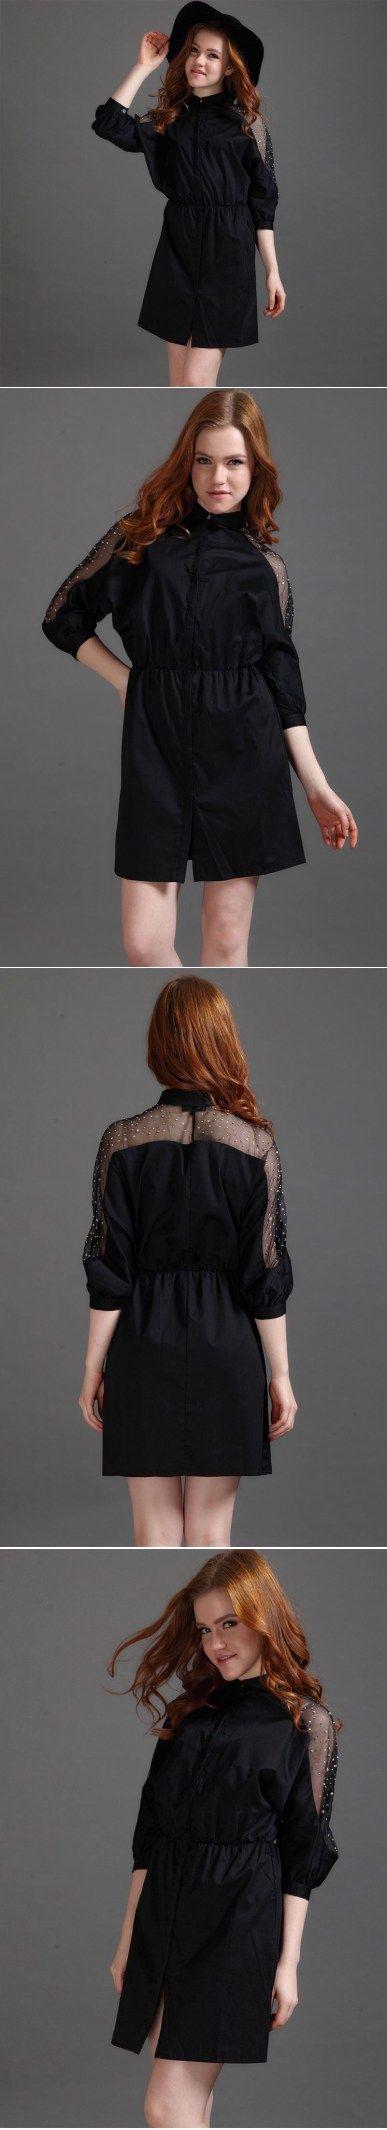 Naughty Backless Dress Short High Neck Mature Sexy Bedroom Sets Rave Lycra…